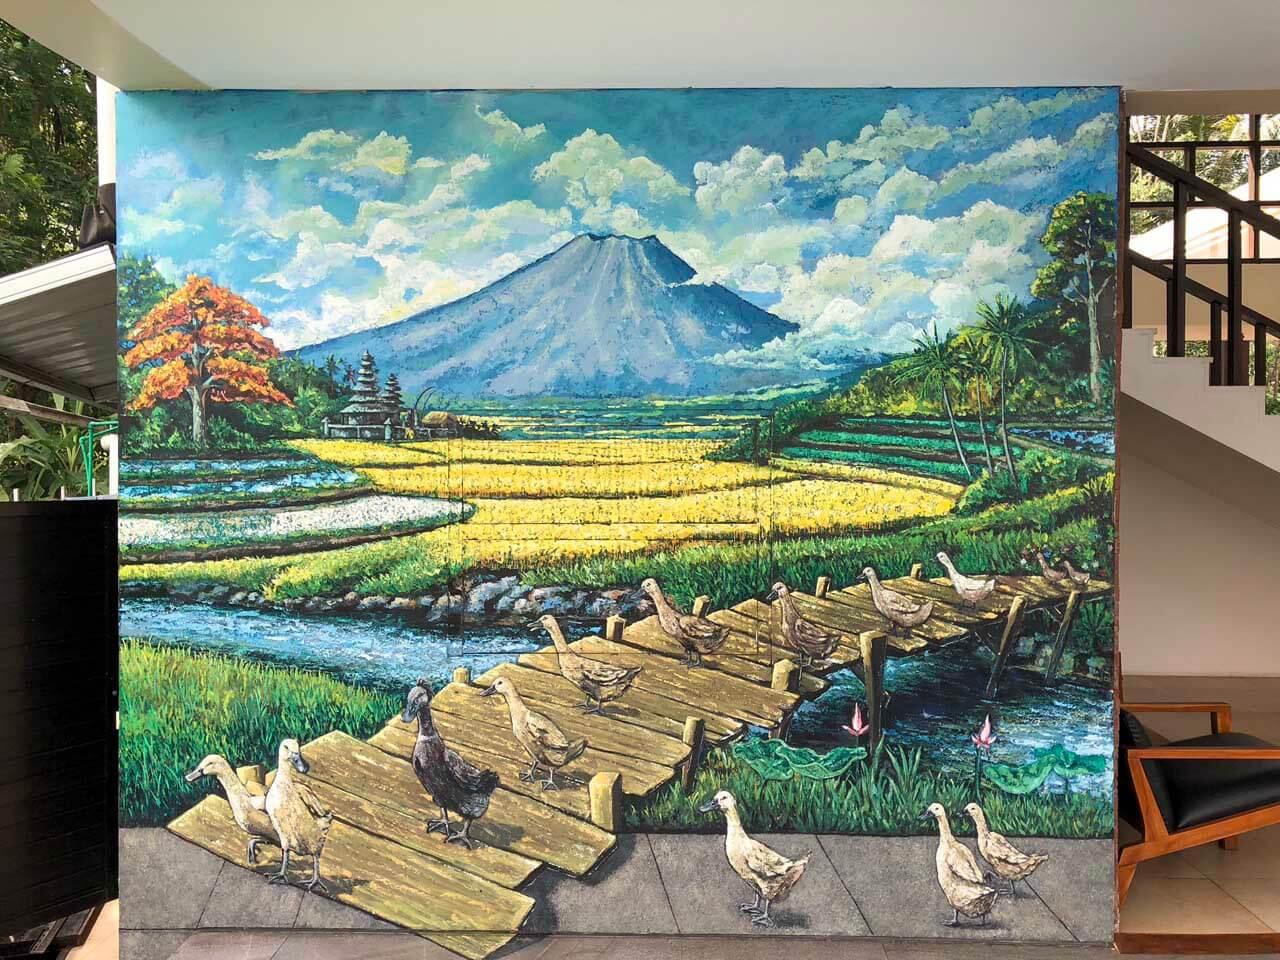 Pintura na parede do UbudOne Villas